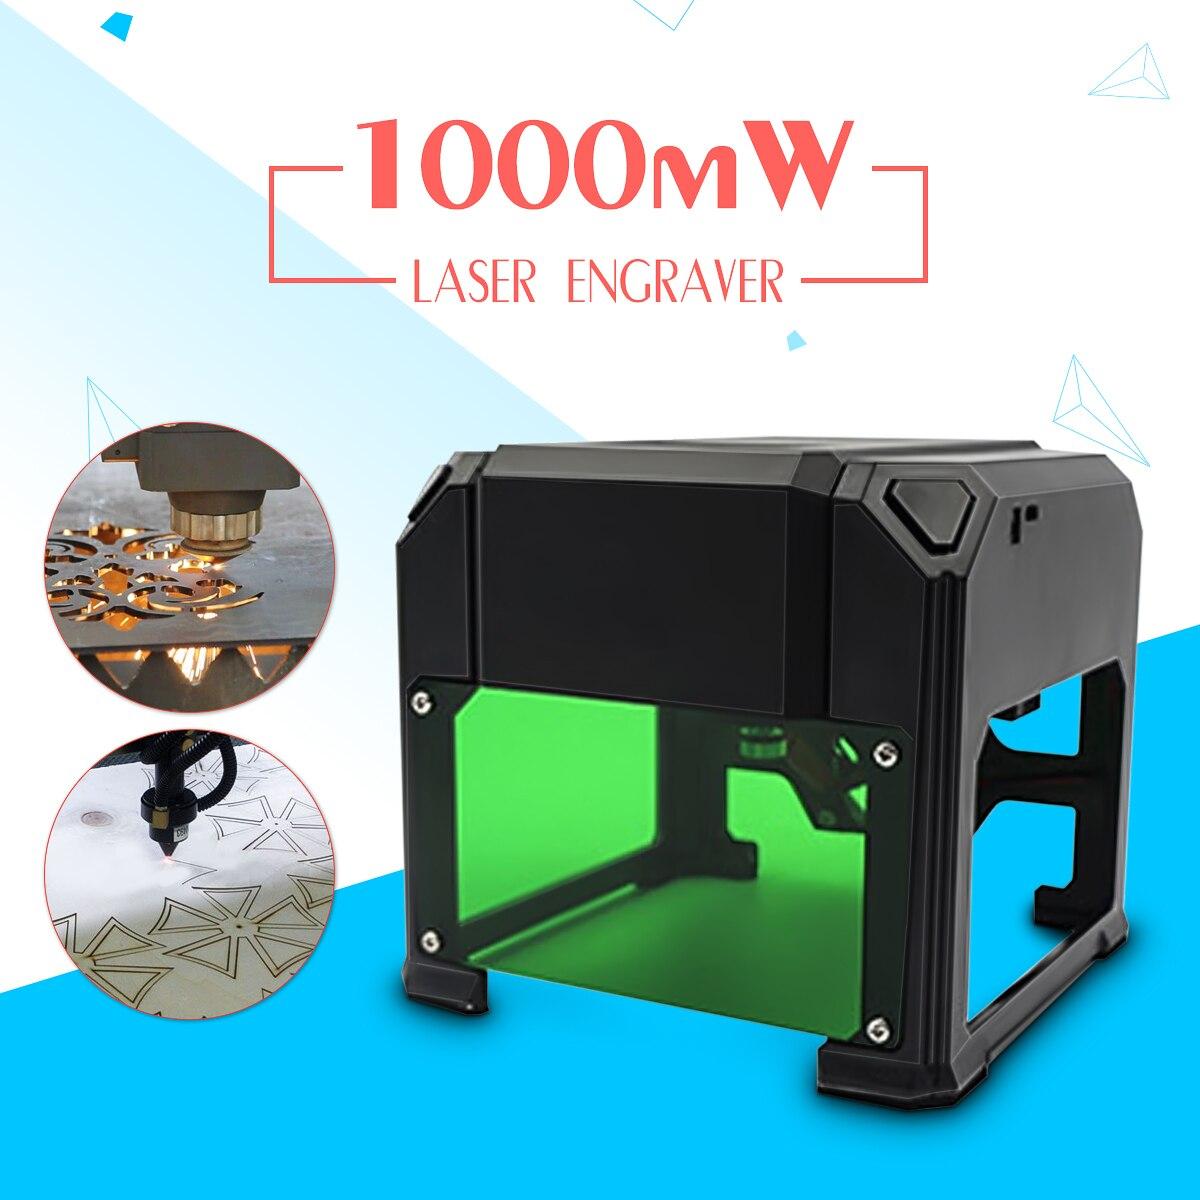 1000 mw Laser Desktop Gravador DIY Logotipo da Marca Da Impressora 80x80mm Gravura Cortador CNC Máquina de gravura do Laser Gama